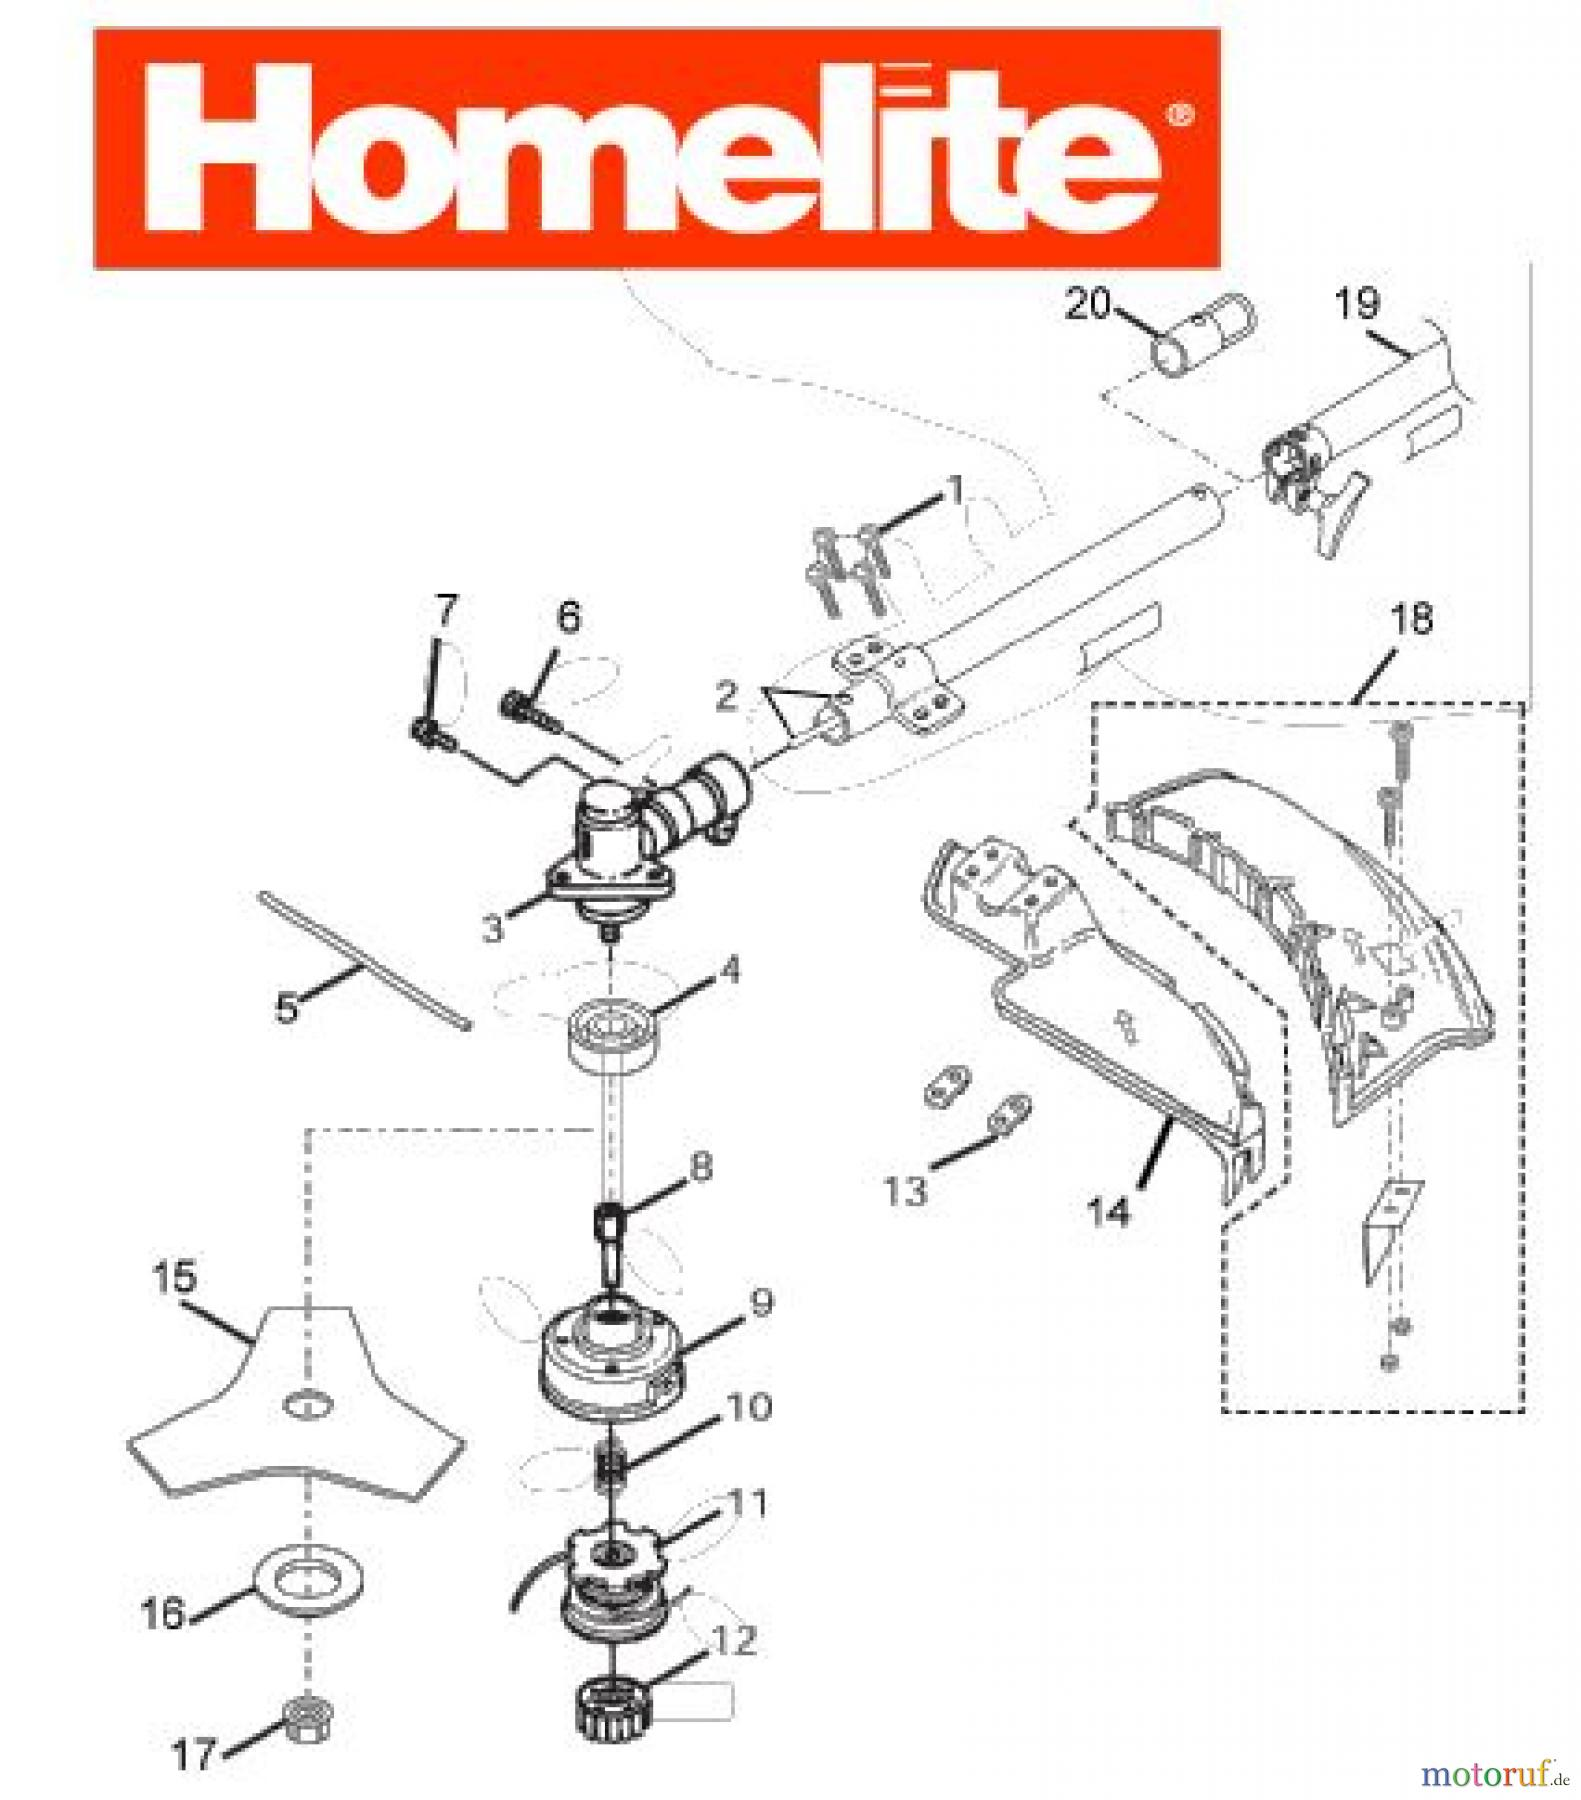 Homelite F3045 Parts